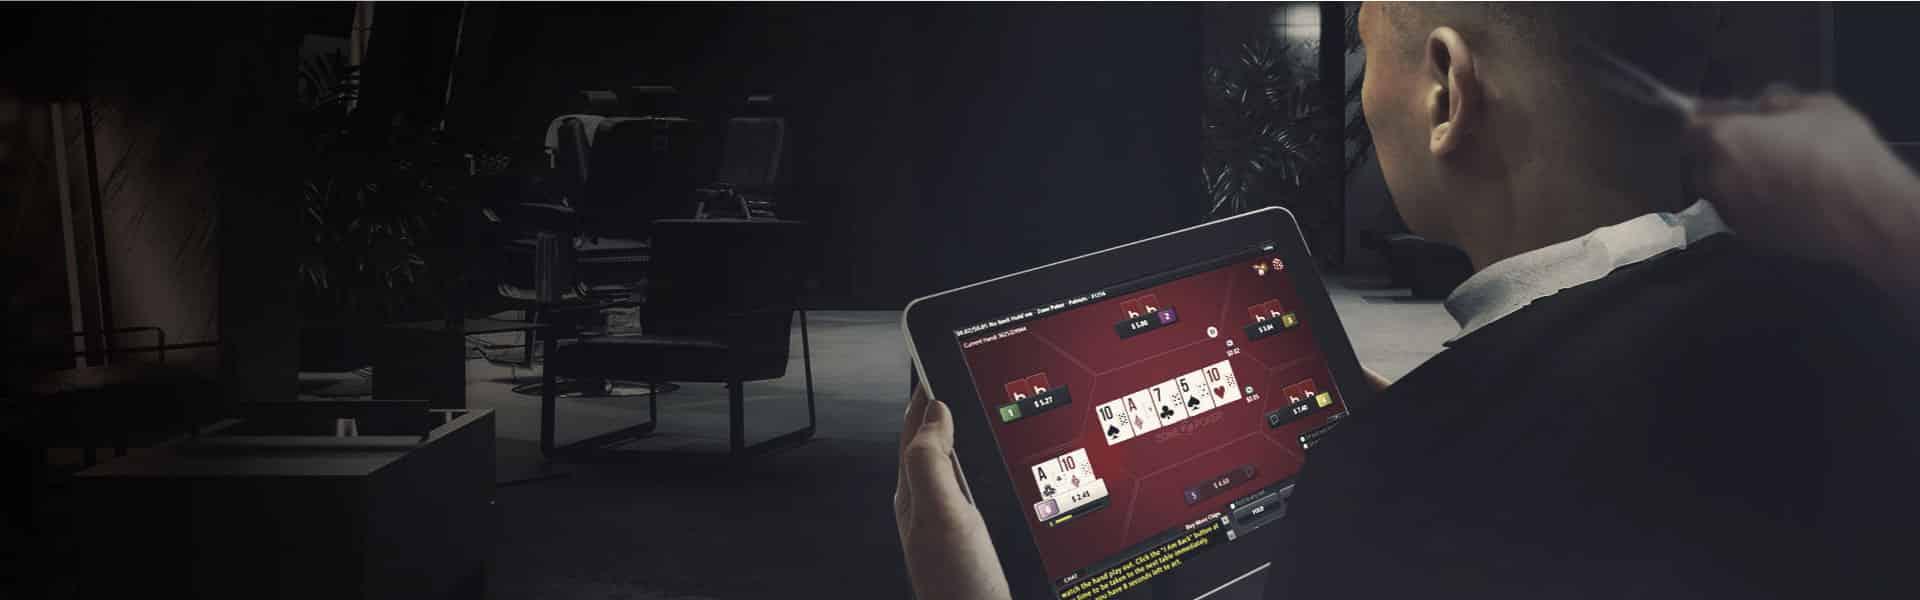 Agen Poker Domino Uang Asli Terpercaya Deposit 10rb